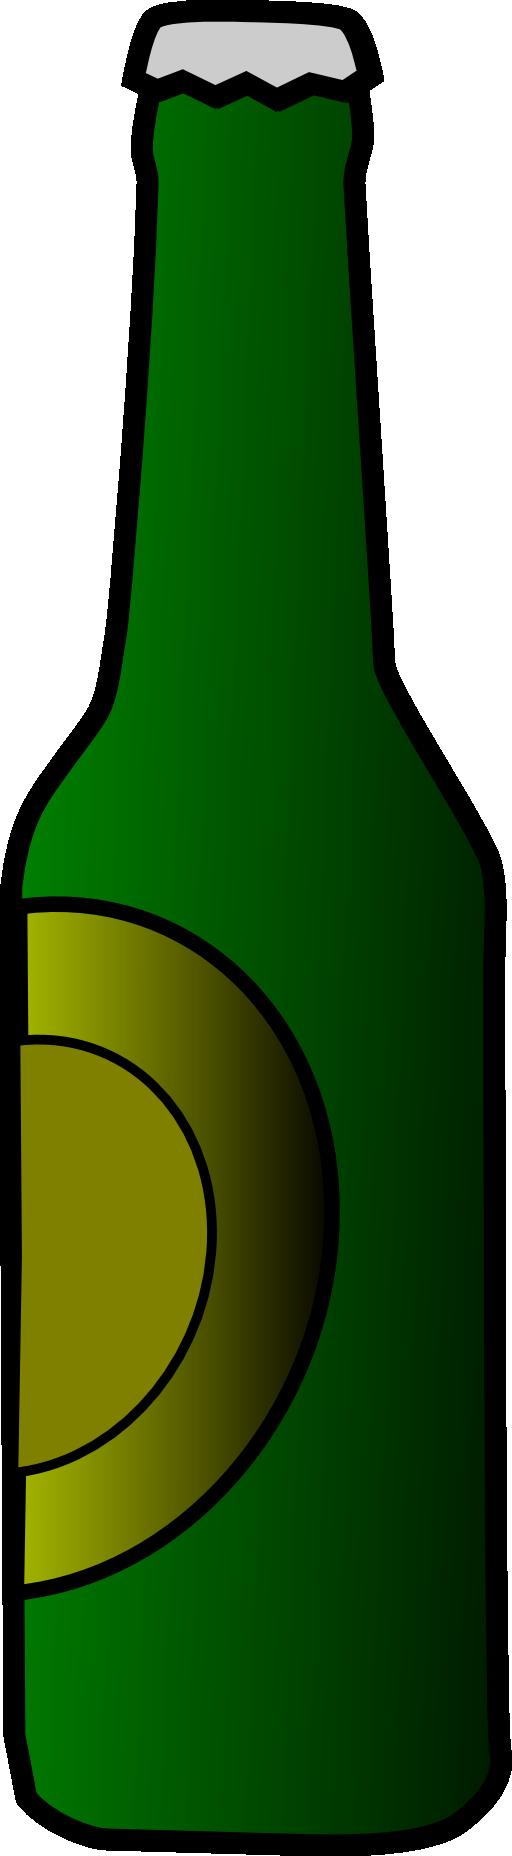 Free Liquor Bottle Cliparts, Download Free Clip Art, Free ...